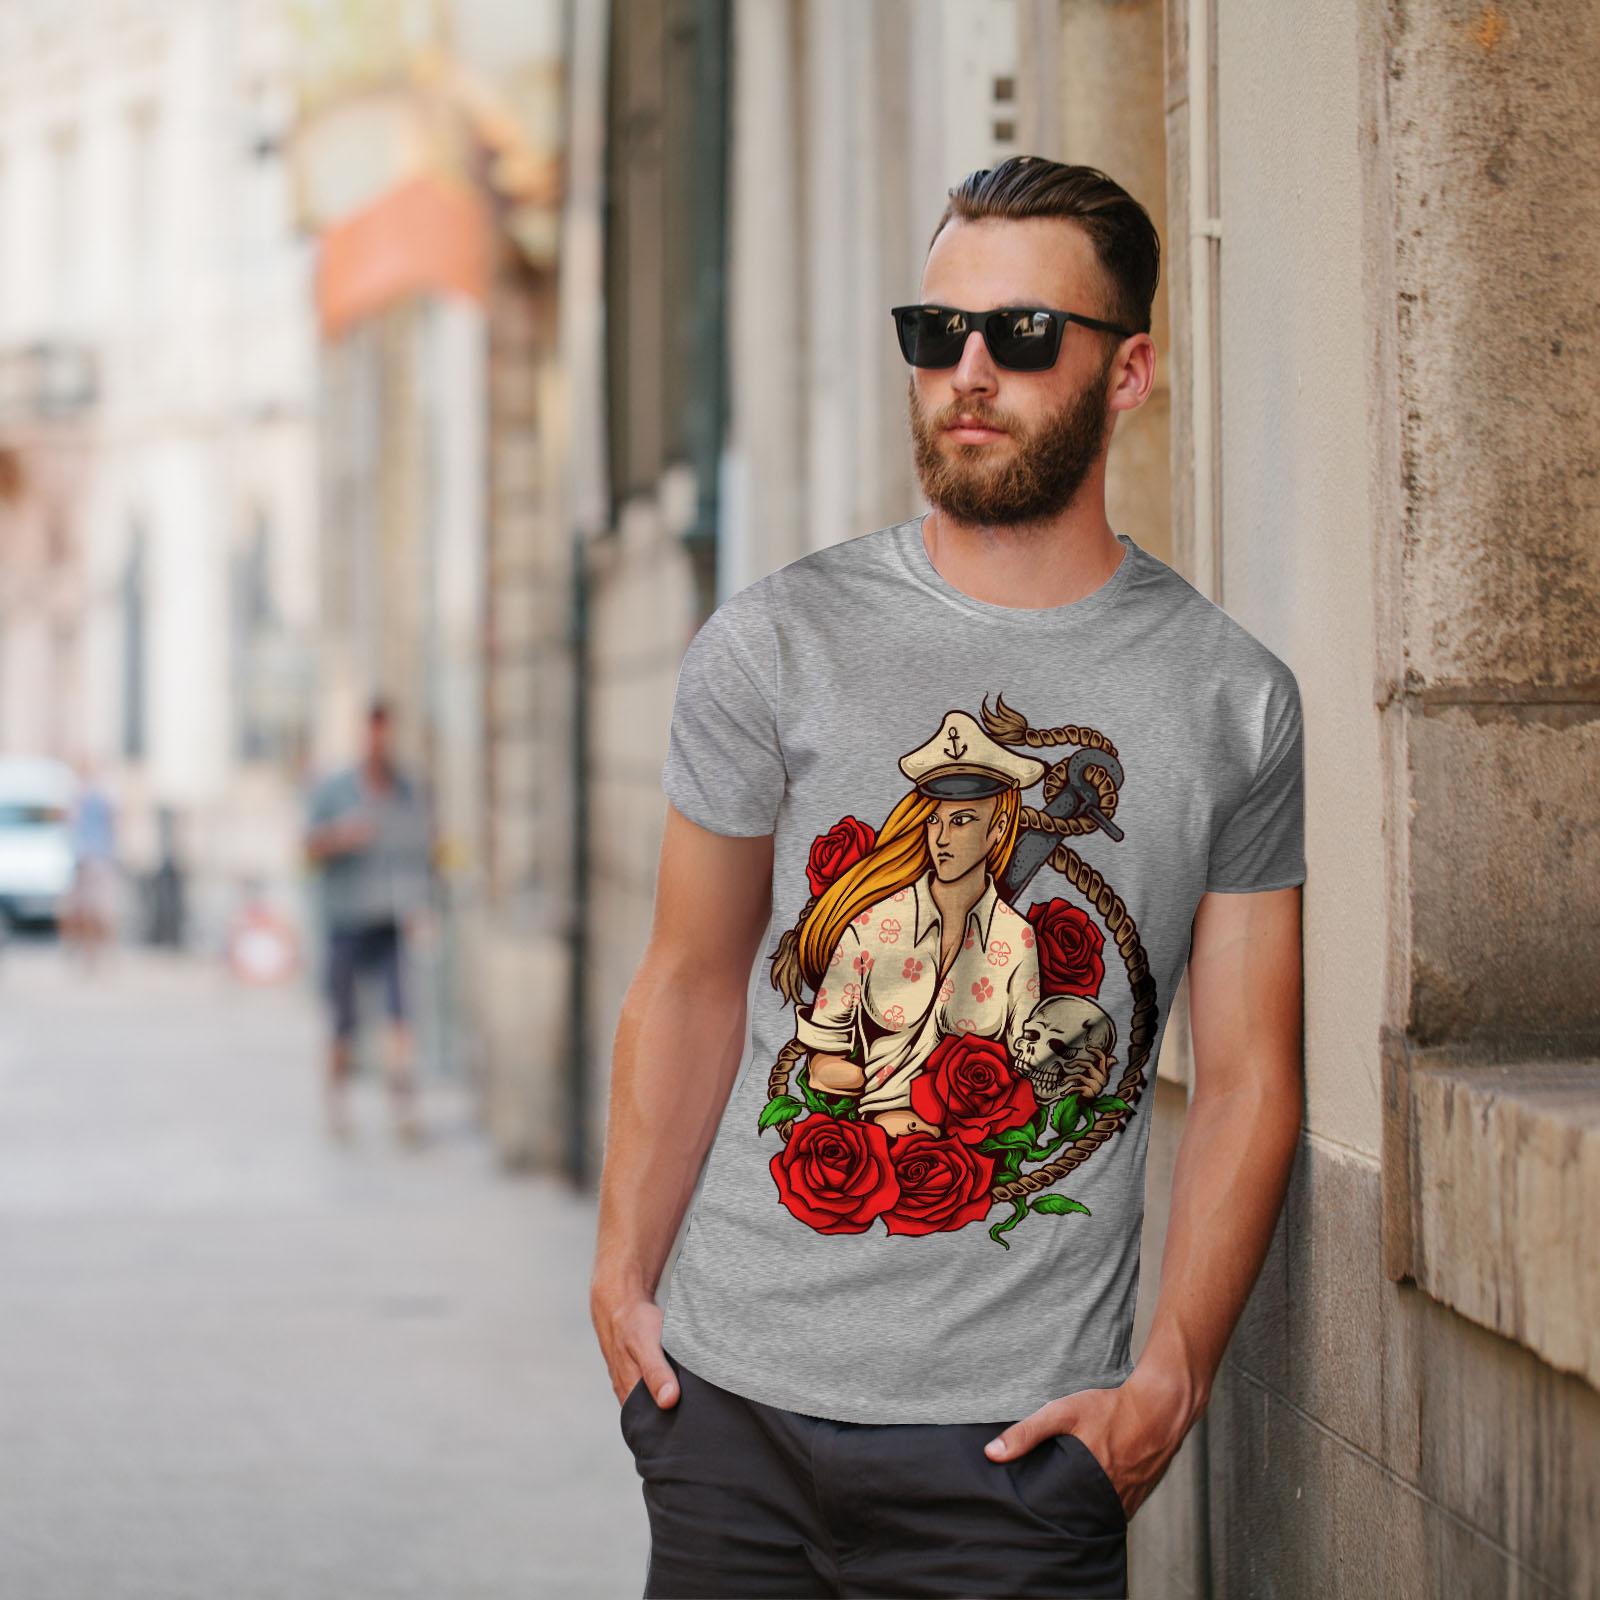 Hot Graphic Design Printed Tee Wellcoda Buenos Aires City Fashion Mens T-shirt